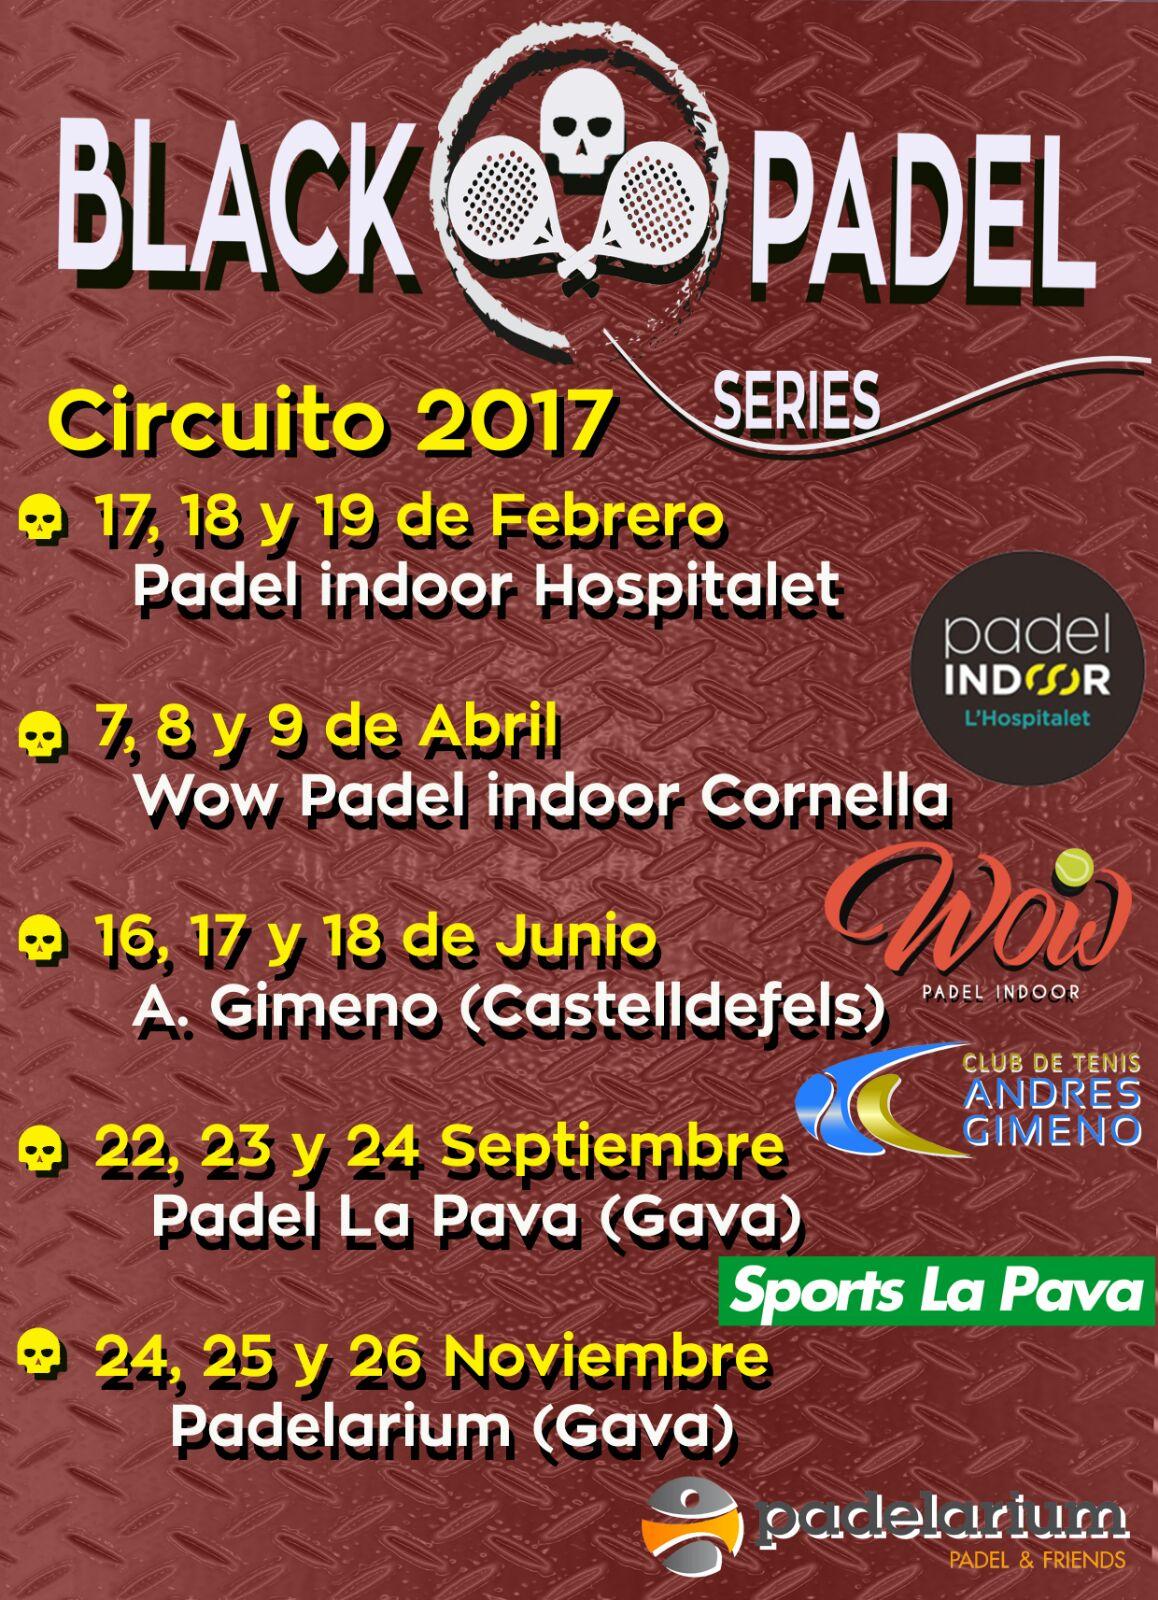 FIDELIA BLACK PADEL SERIES